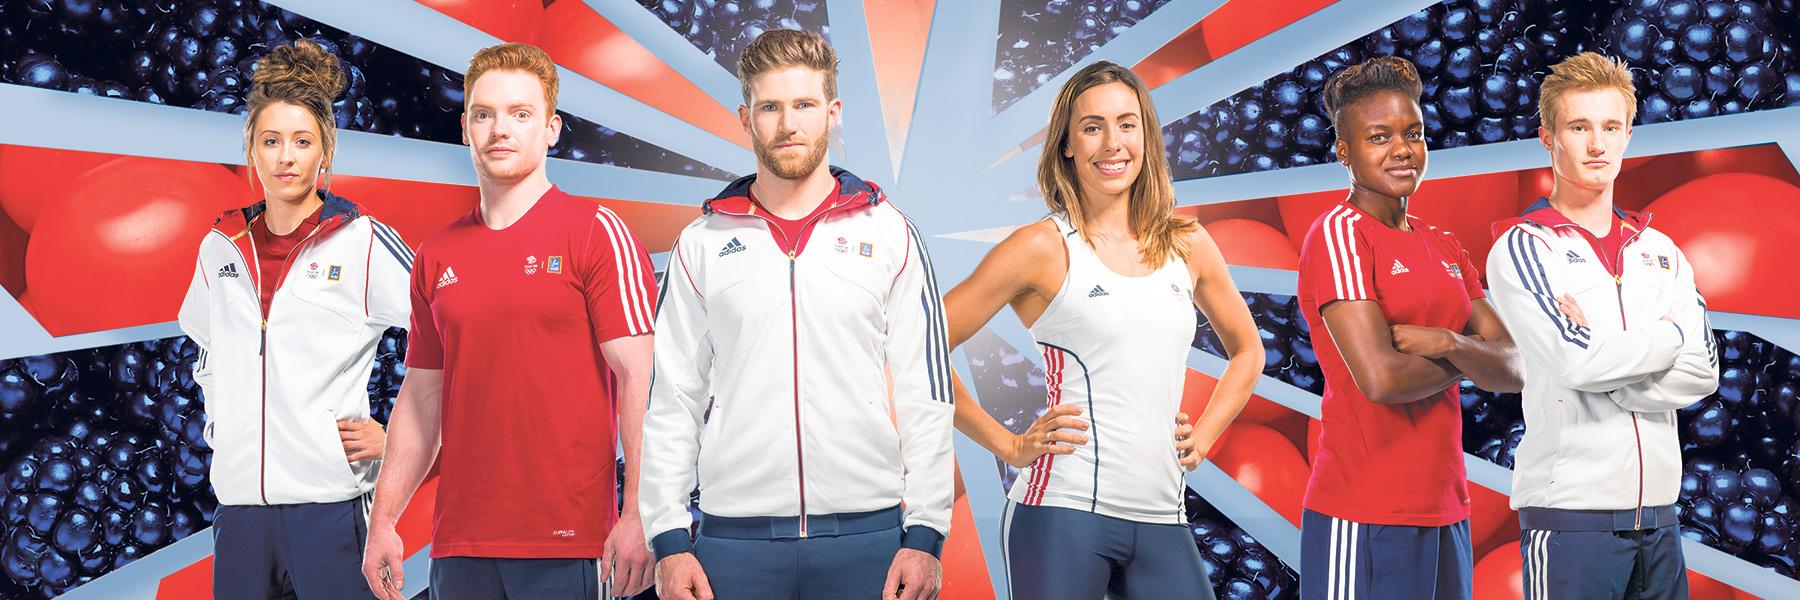 Aldi & Olympics Team GB - Grow Your Champion